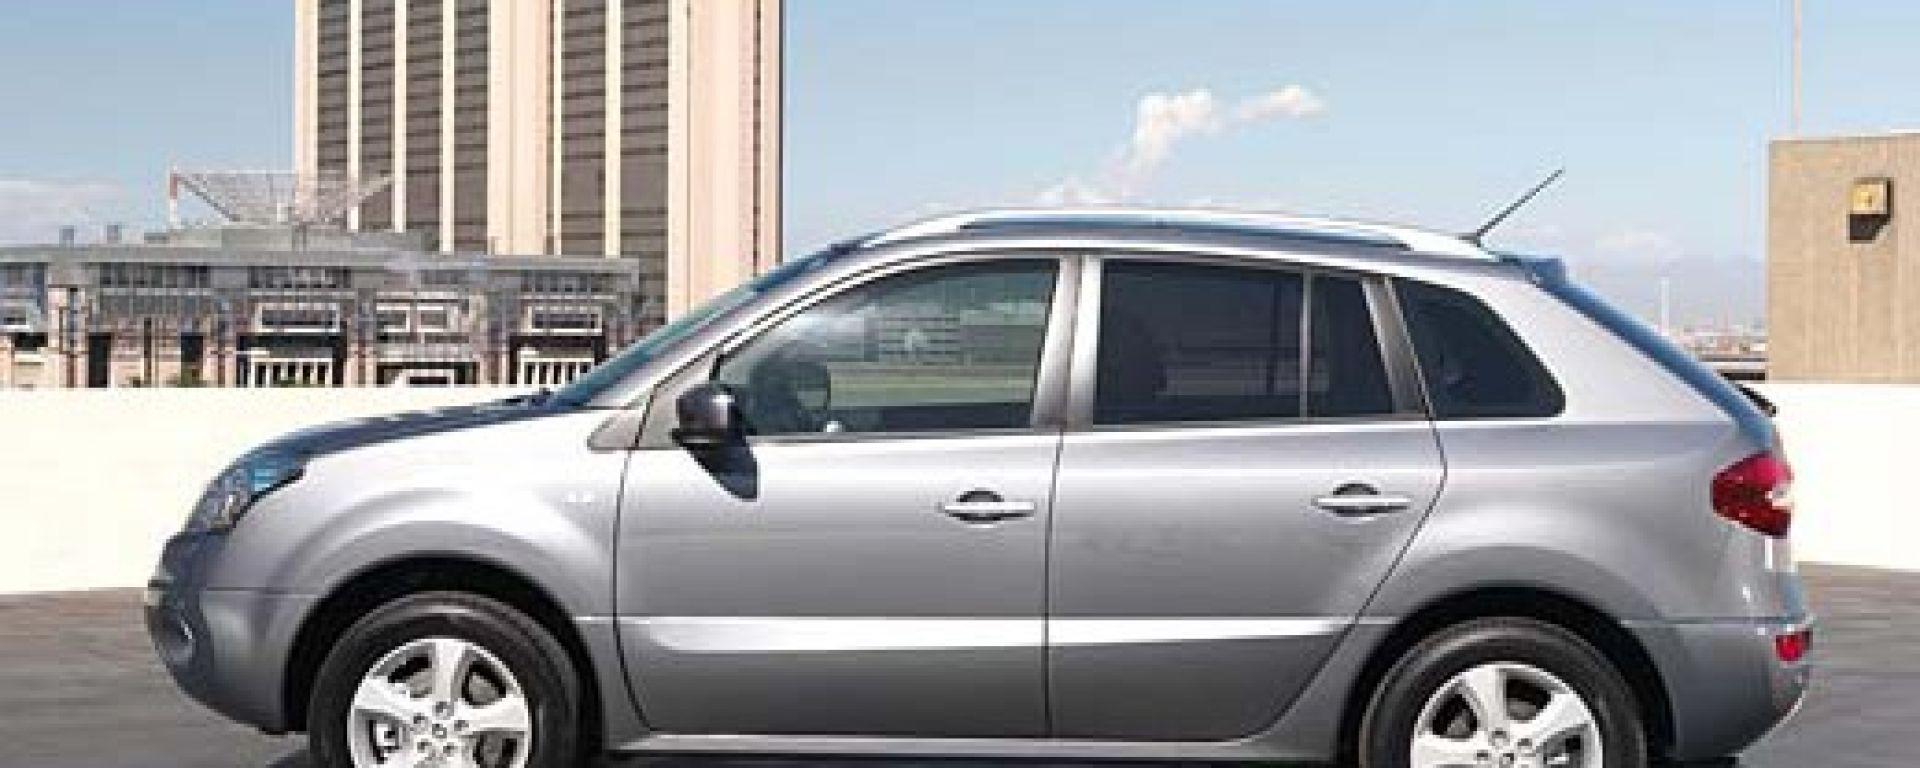 La Renault Koleos in dettaglio